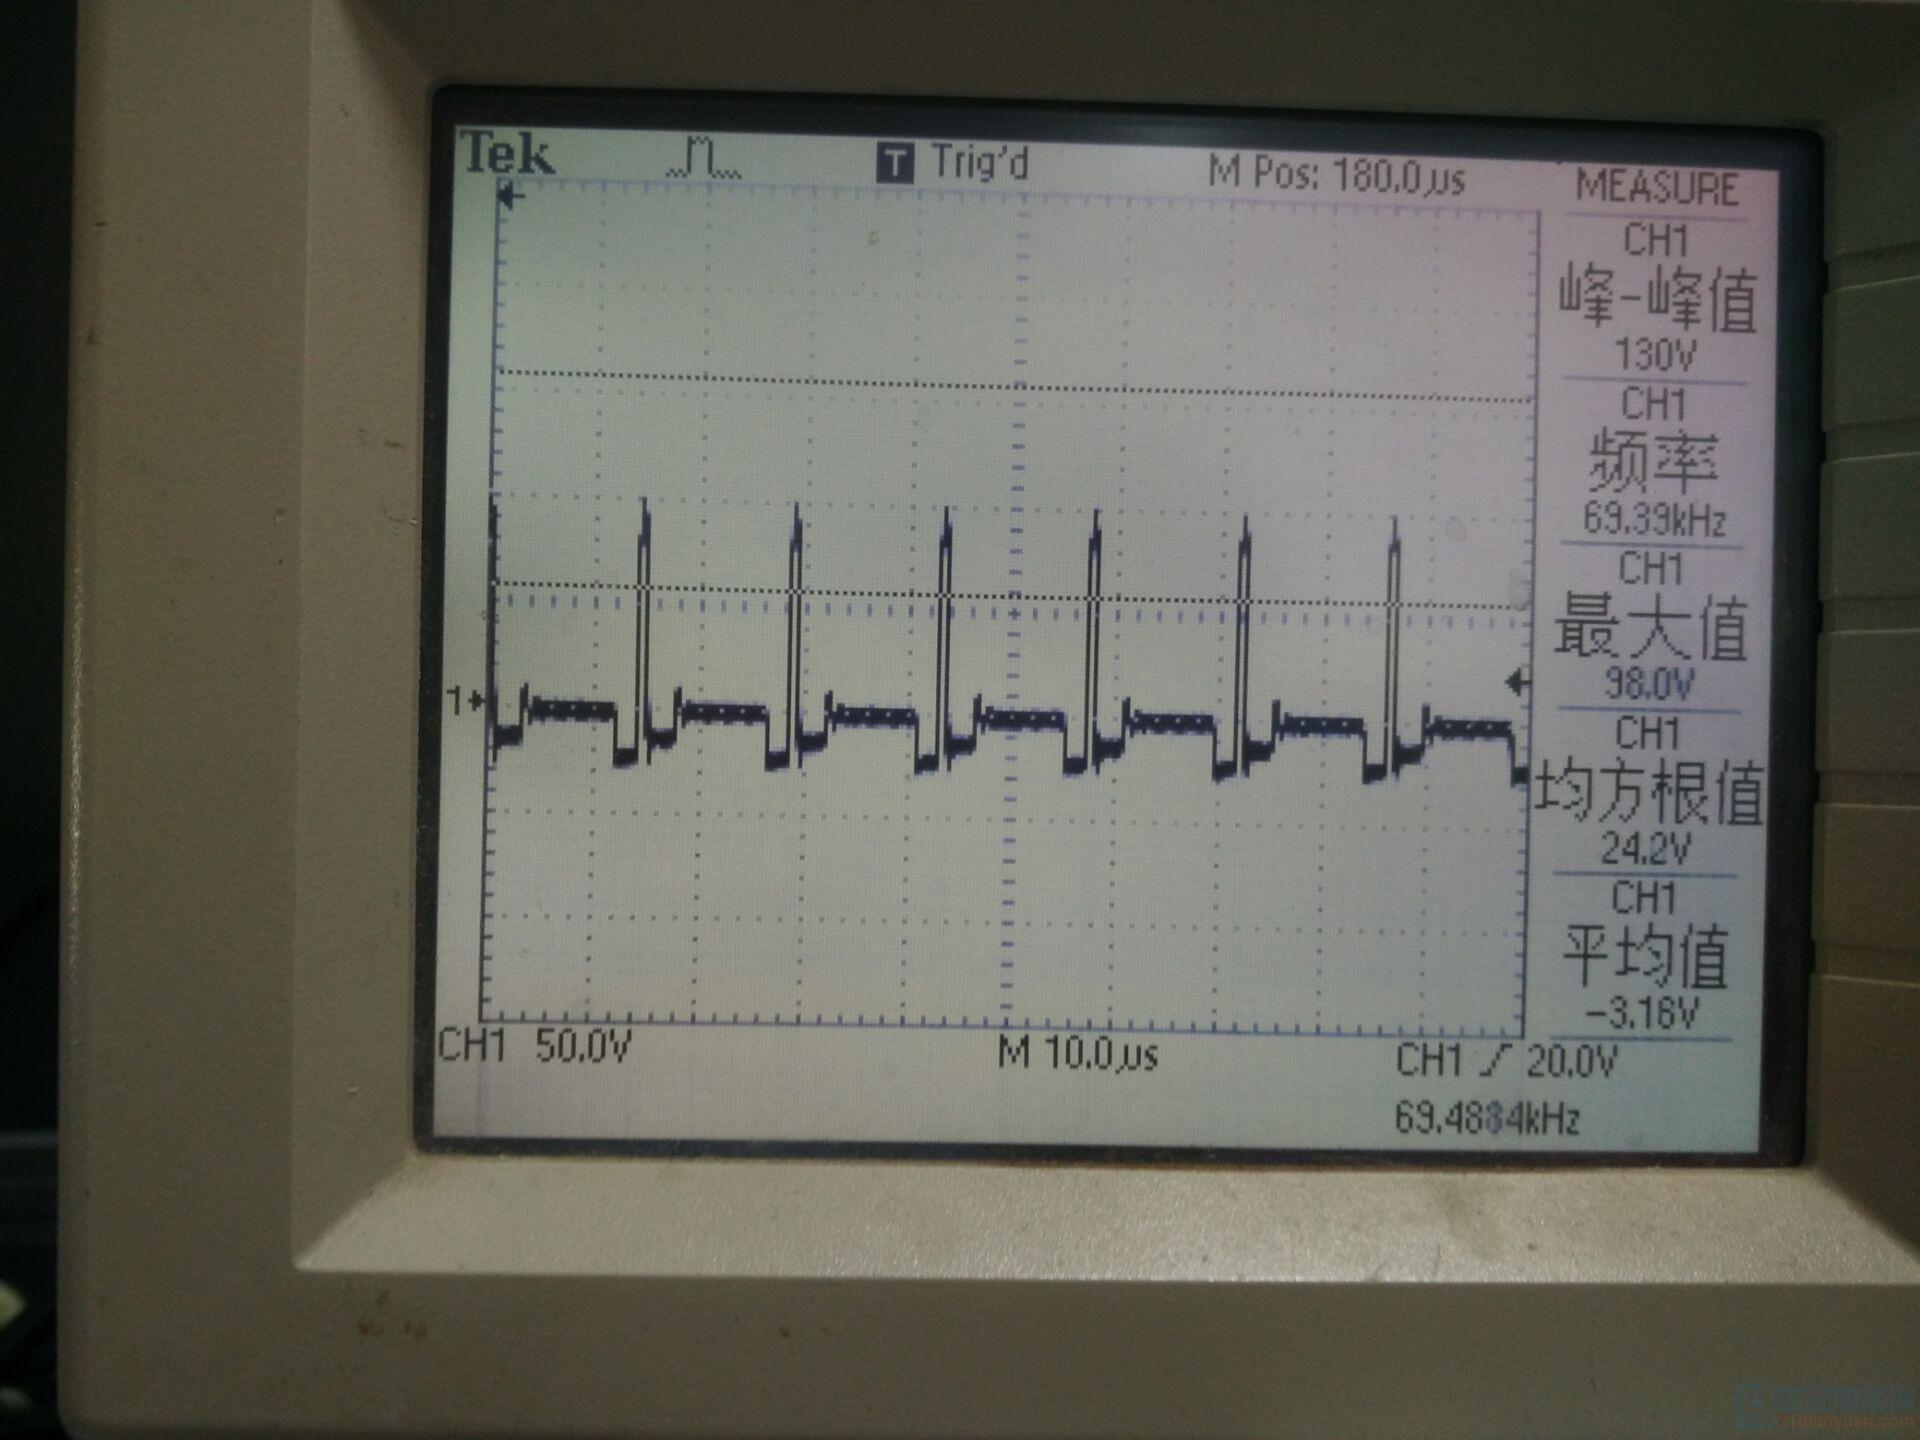 负载5V1A的时候mos管的DS波形